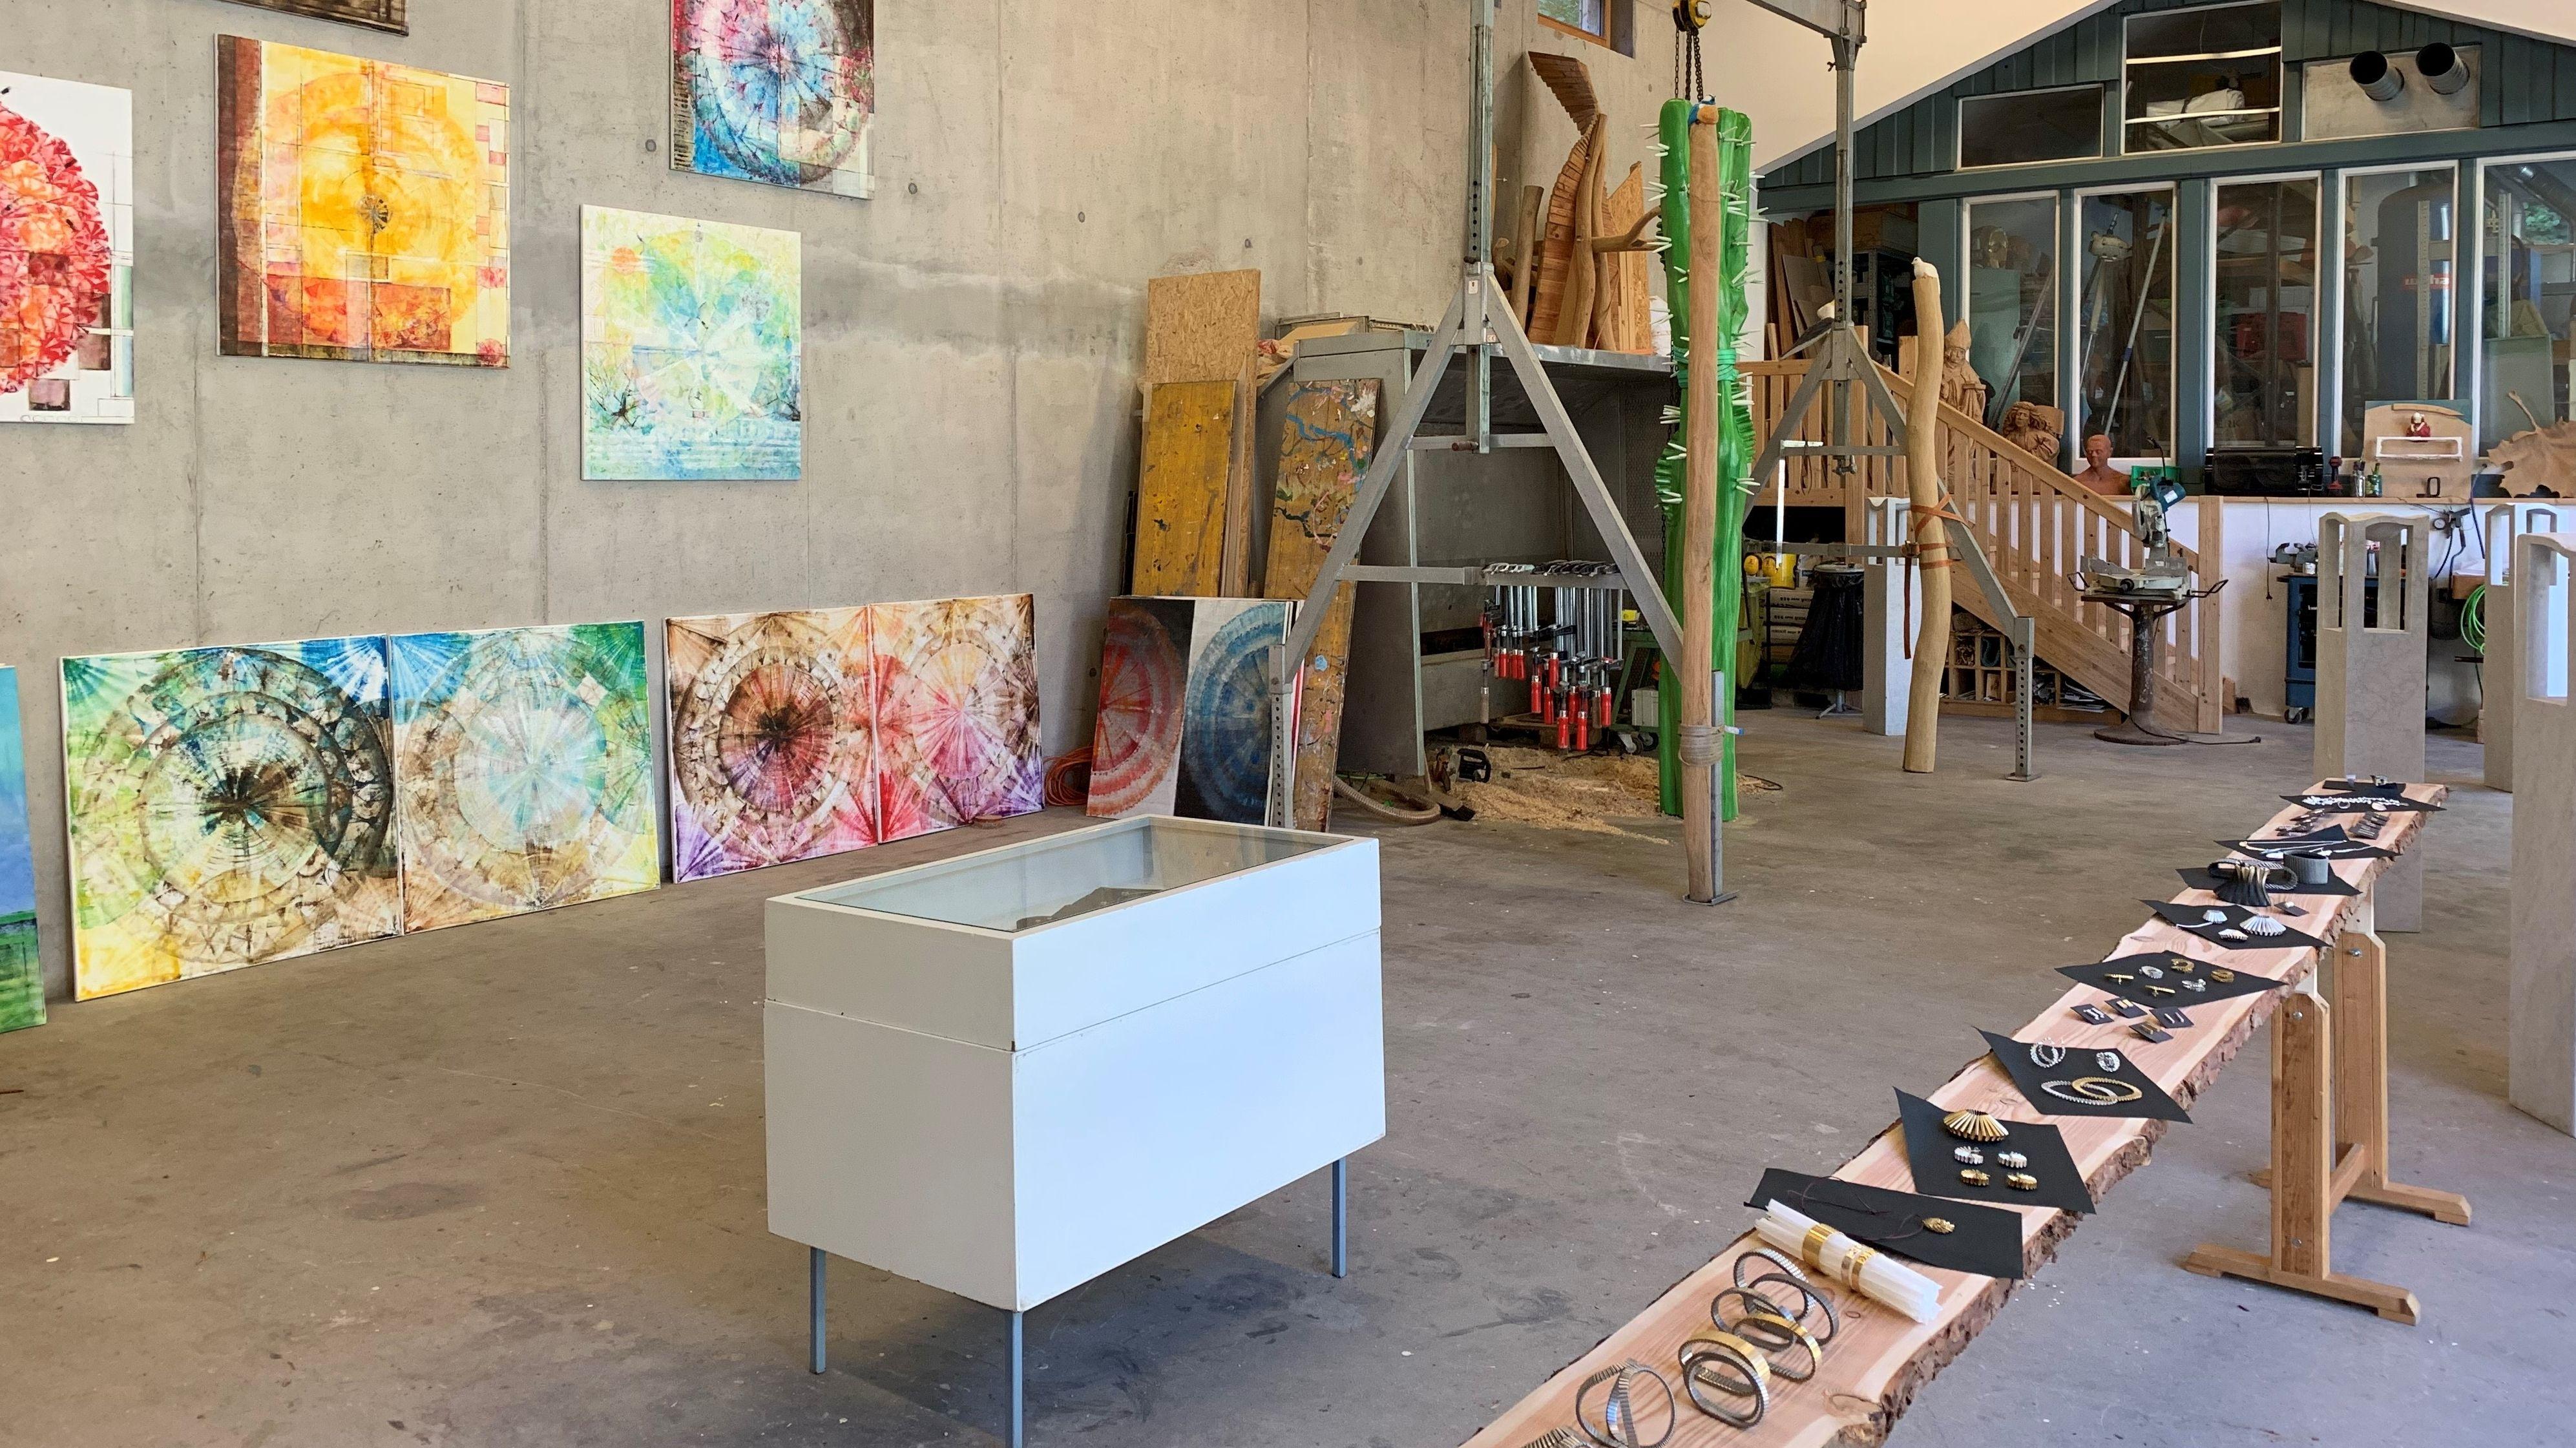 Ateliertage in Oberfranken